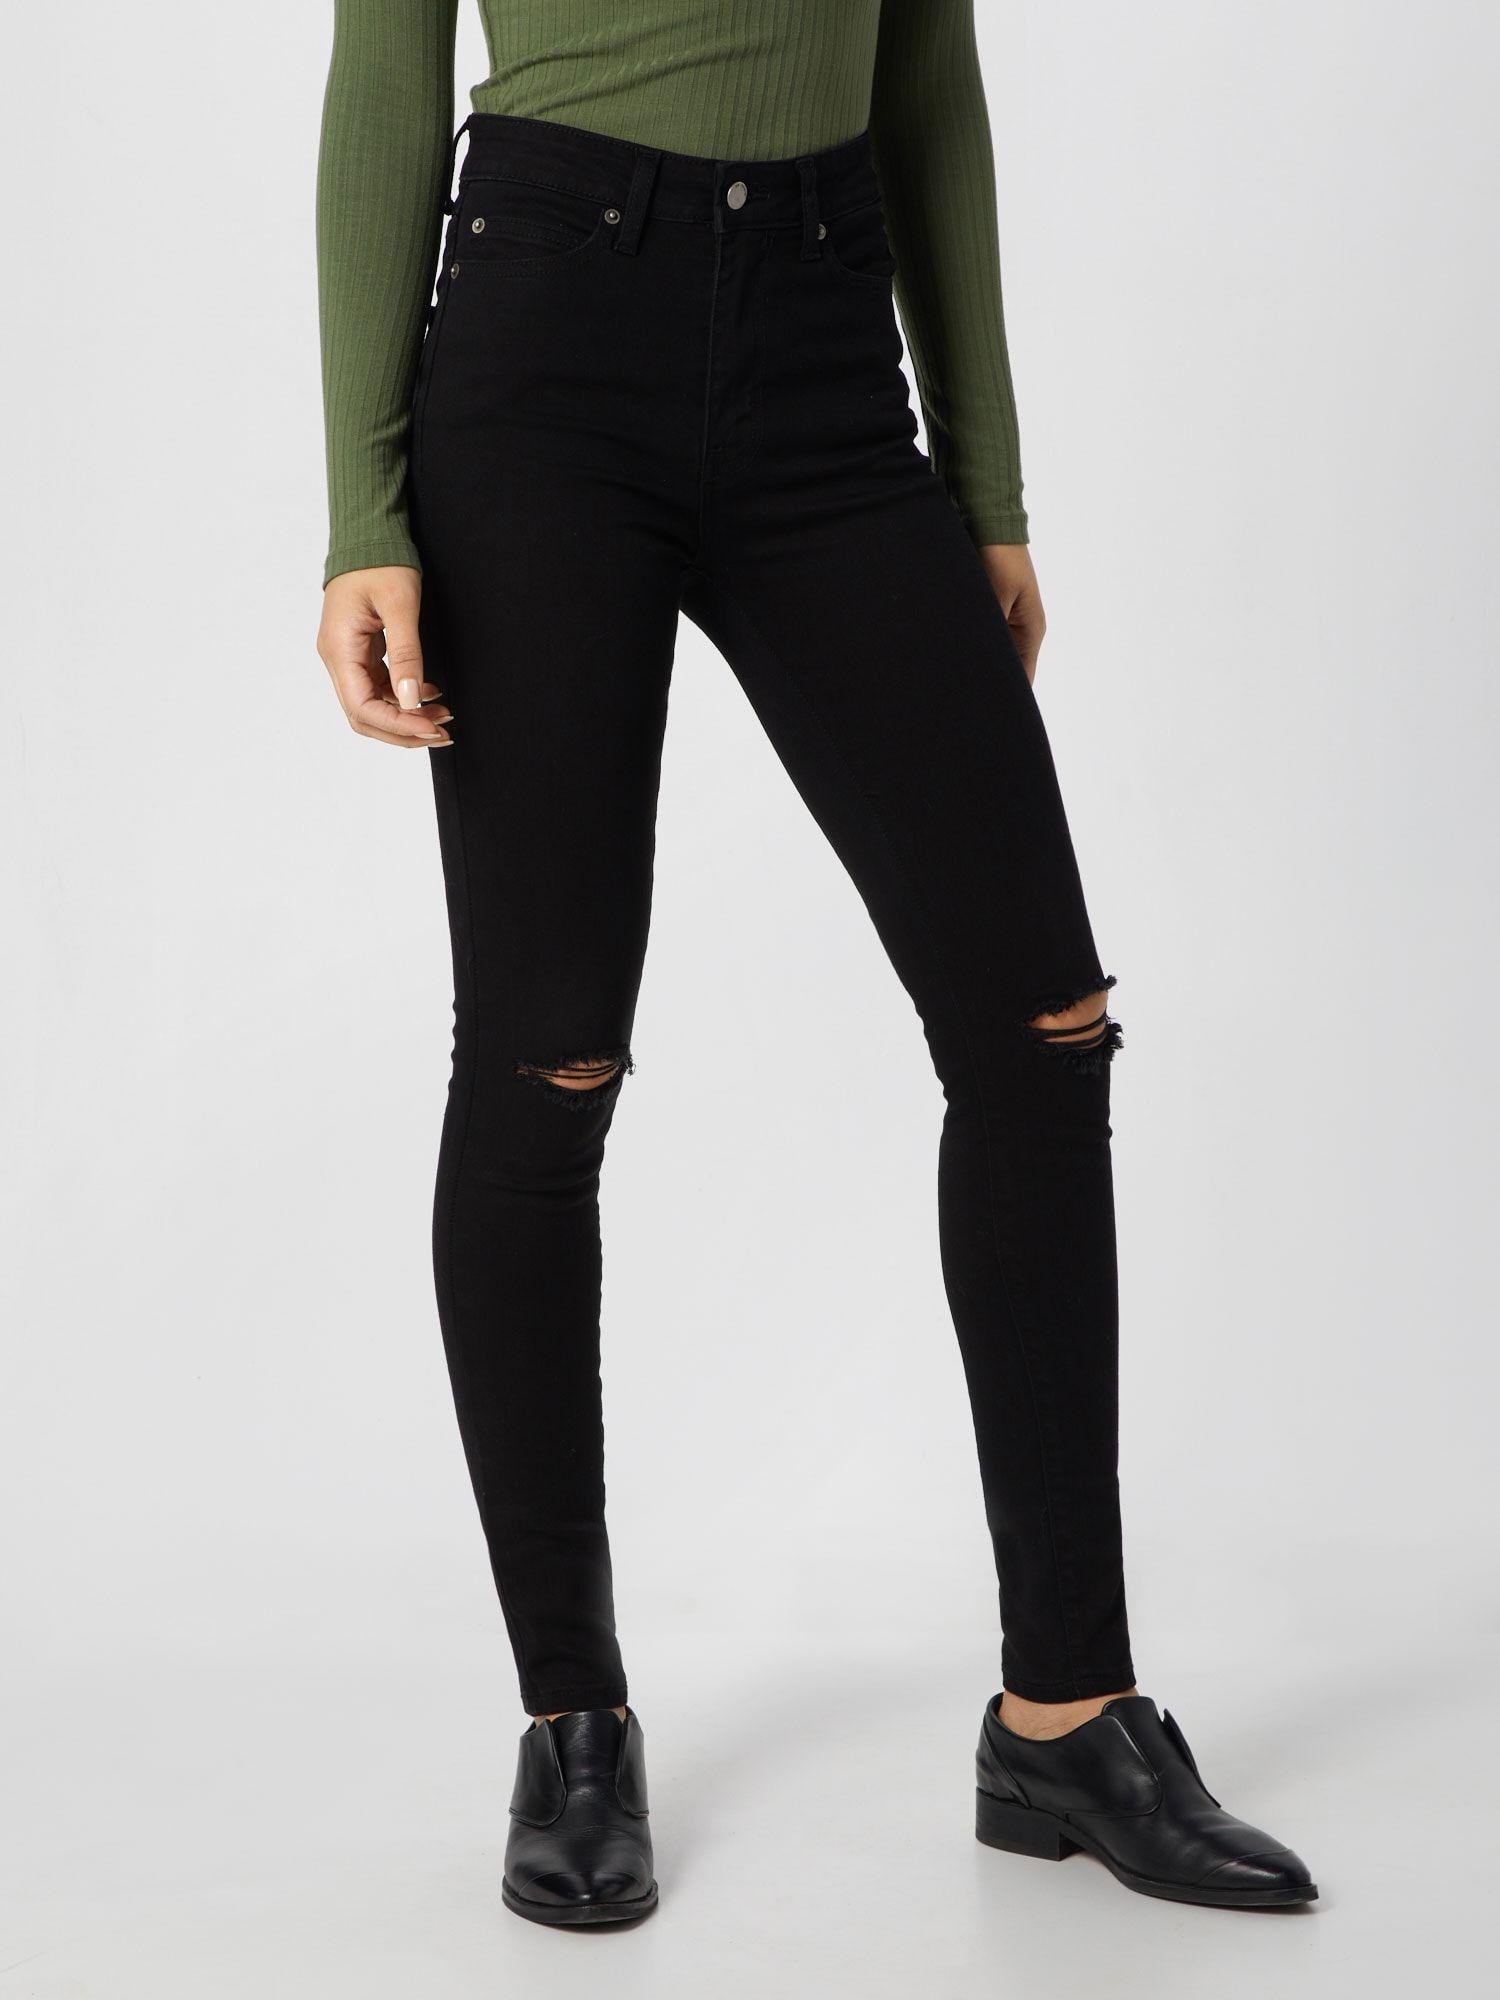 Dr. Denim Jeans 'Erin' Damen, Black Denim, Größe 29